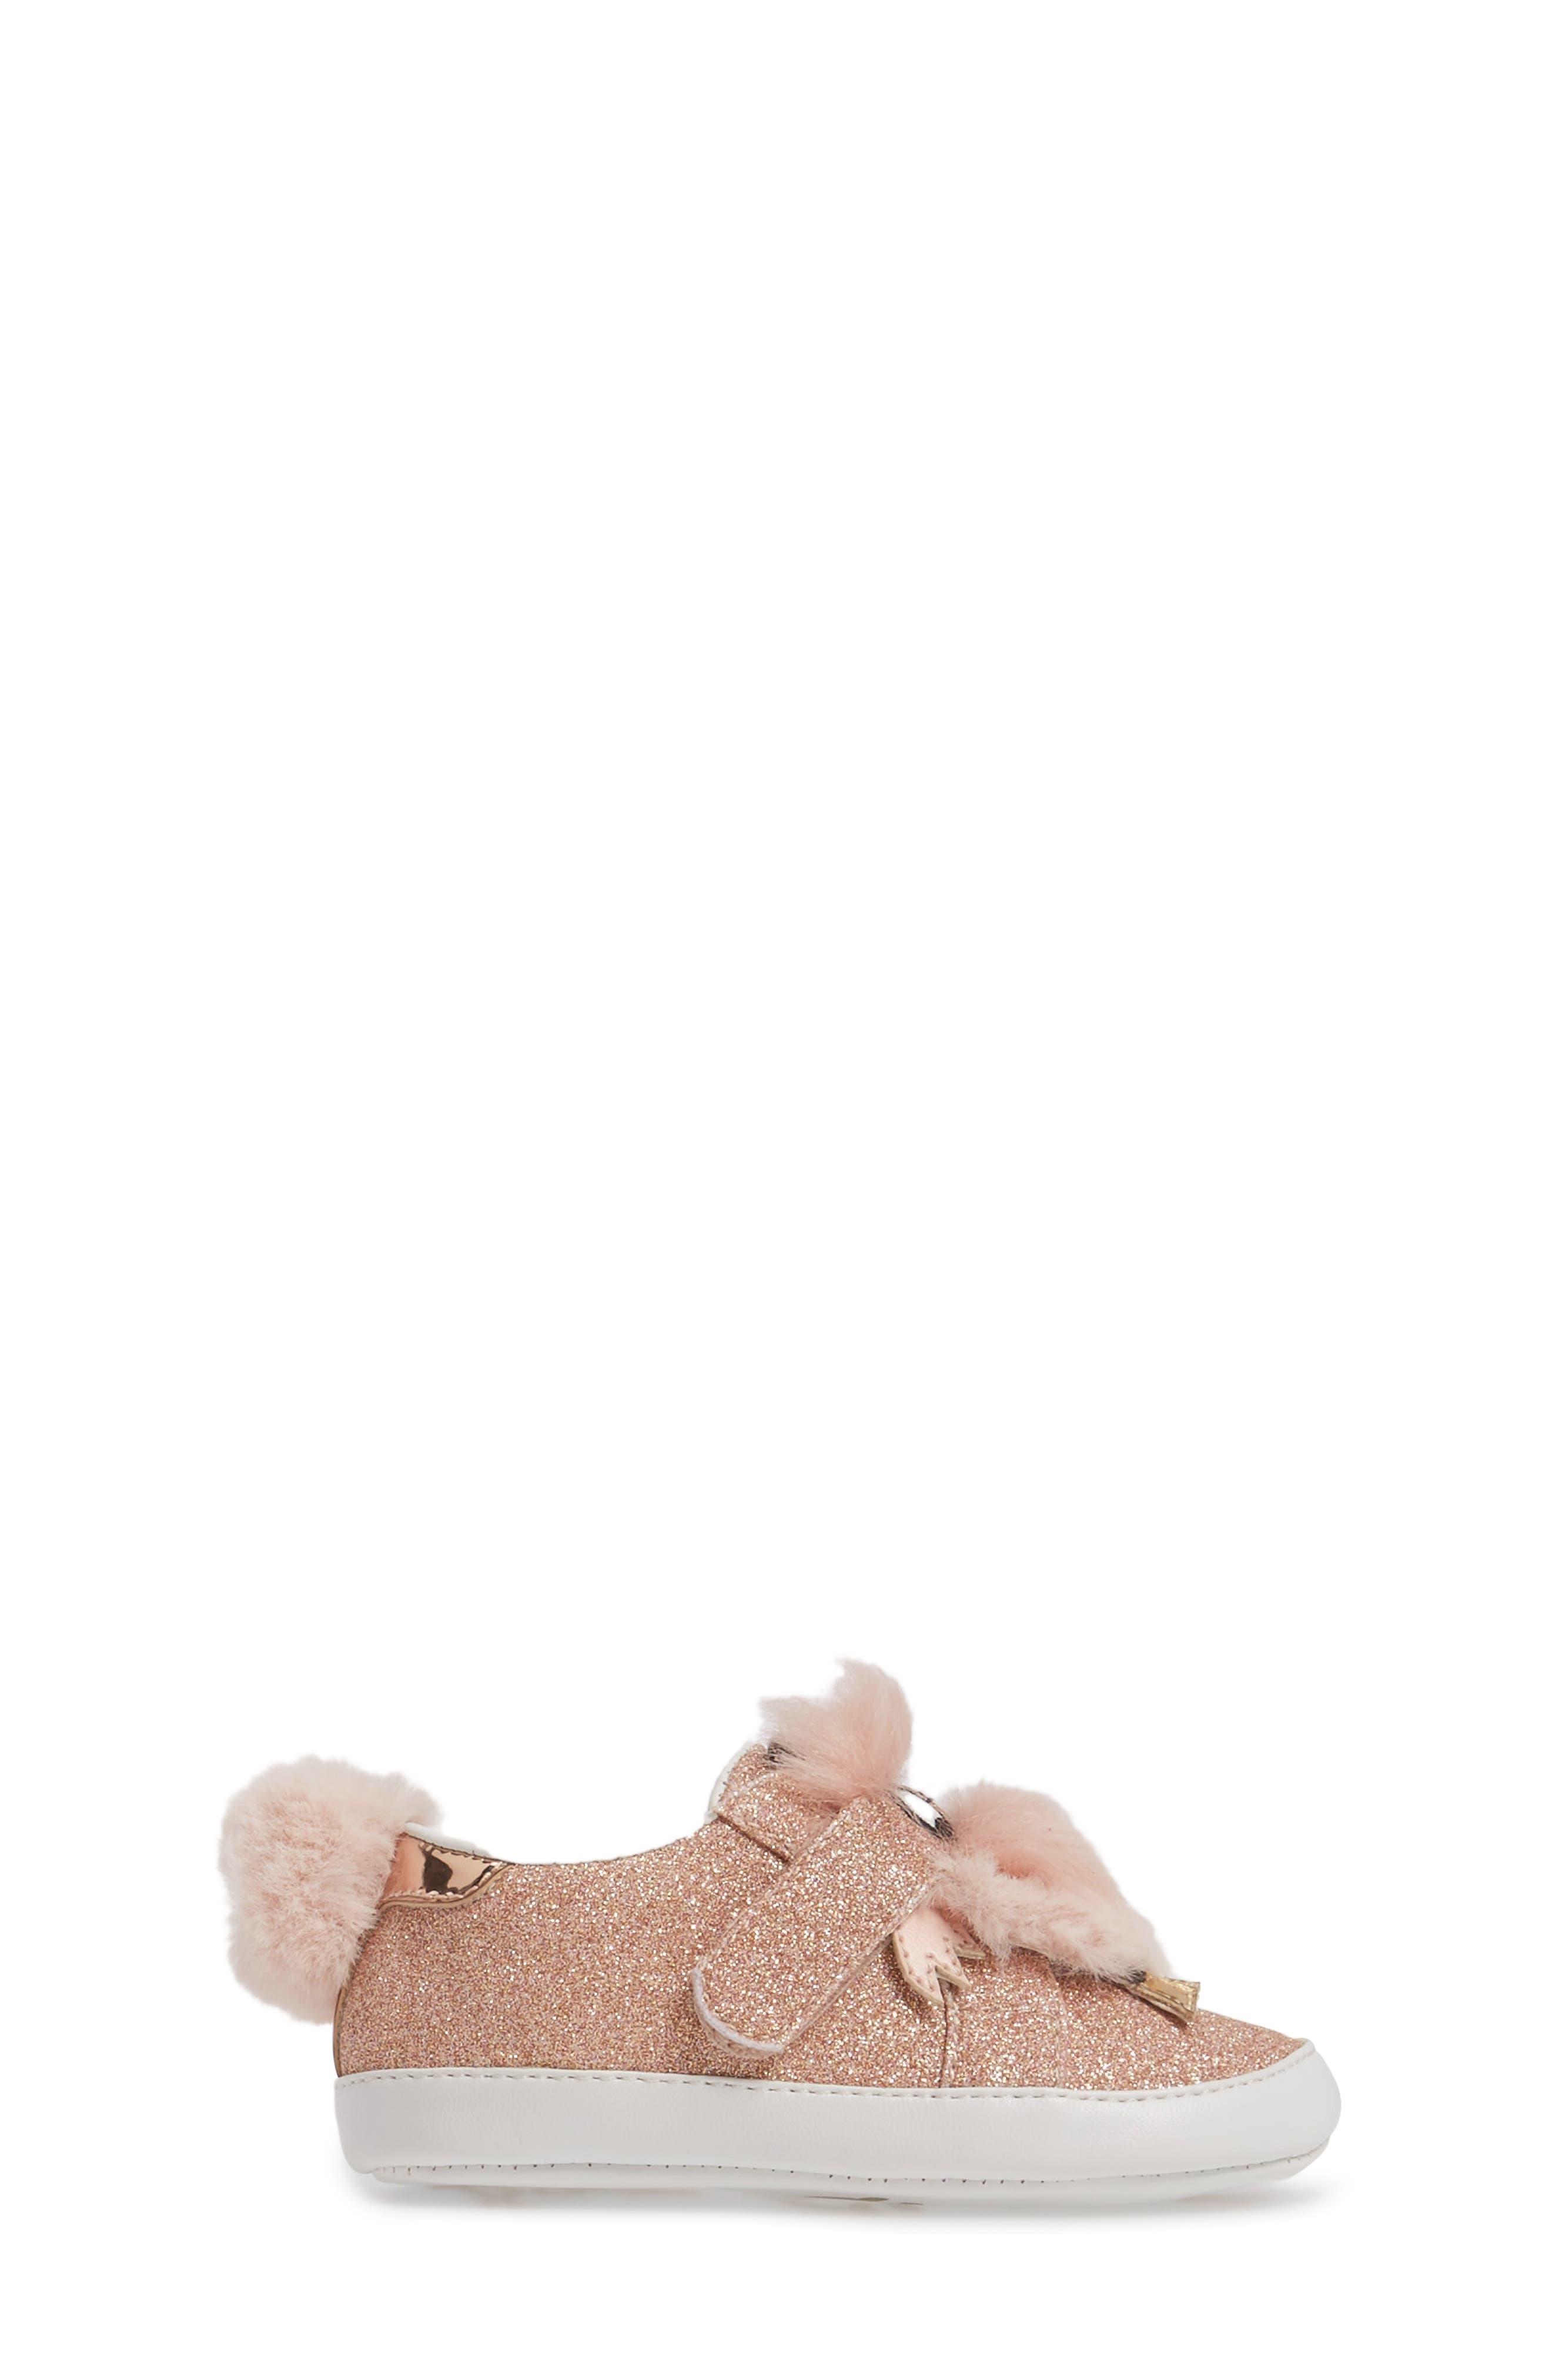 Alternate Image 3  - Sam Edelman Ovee Sneaker (Baby)